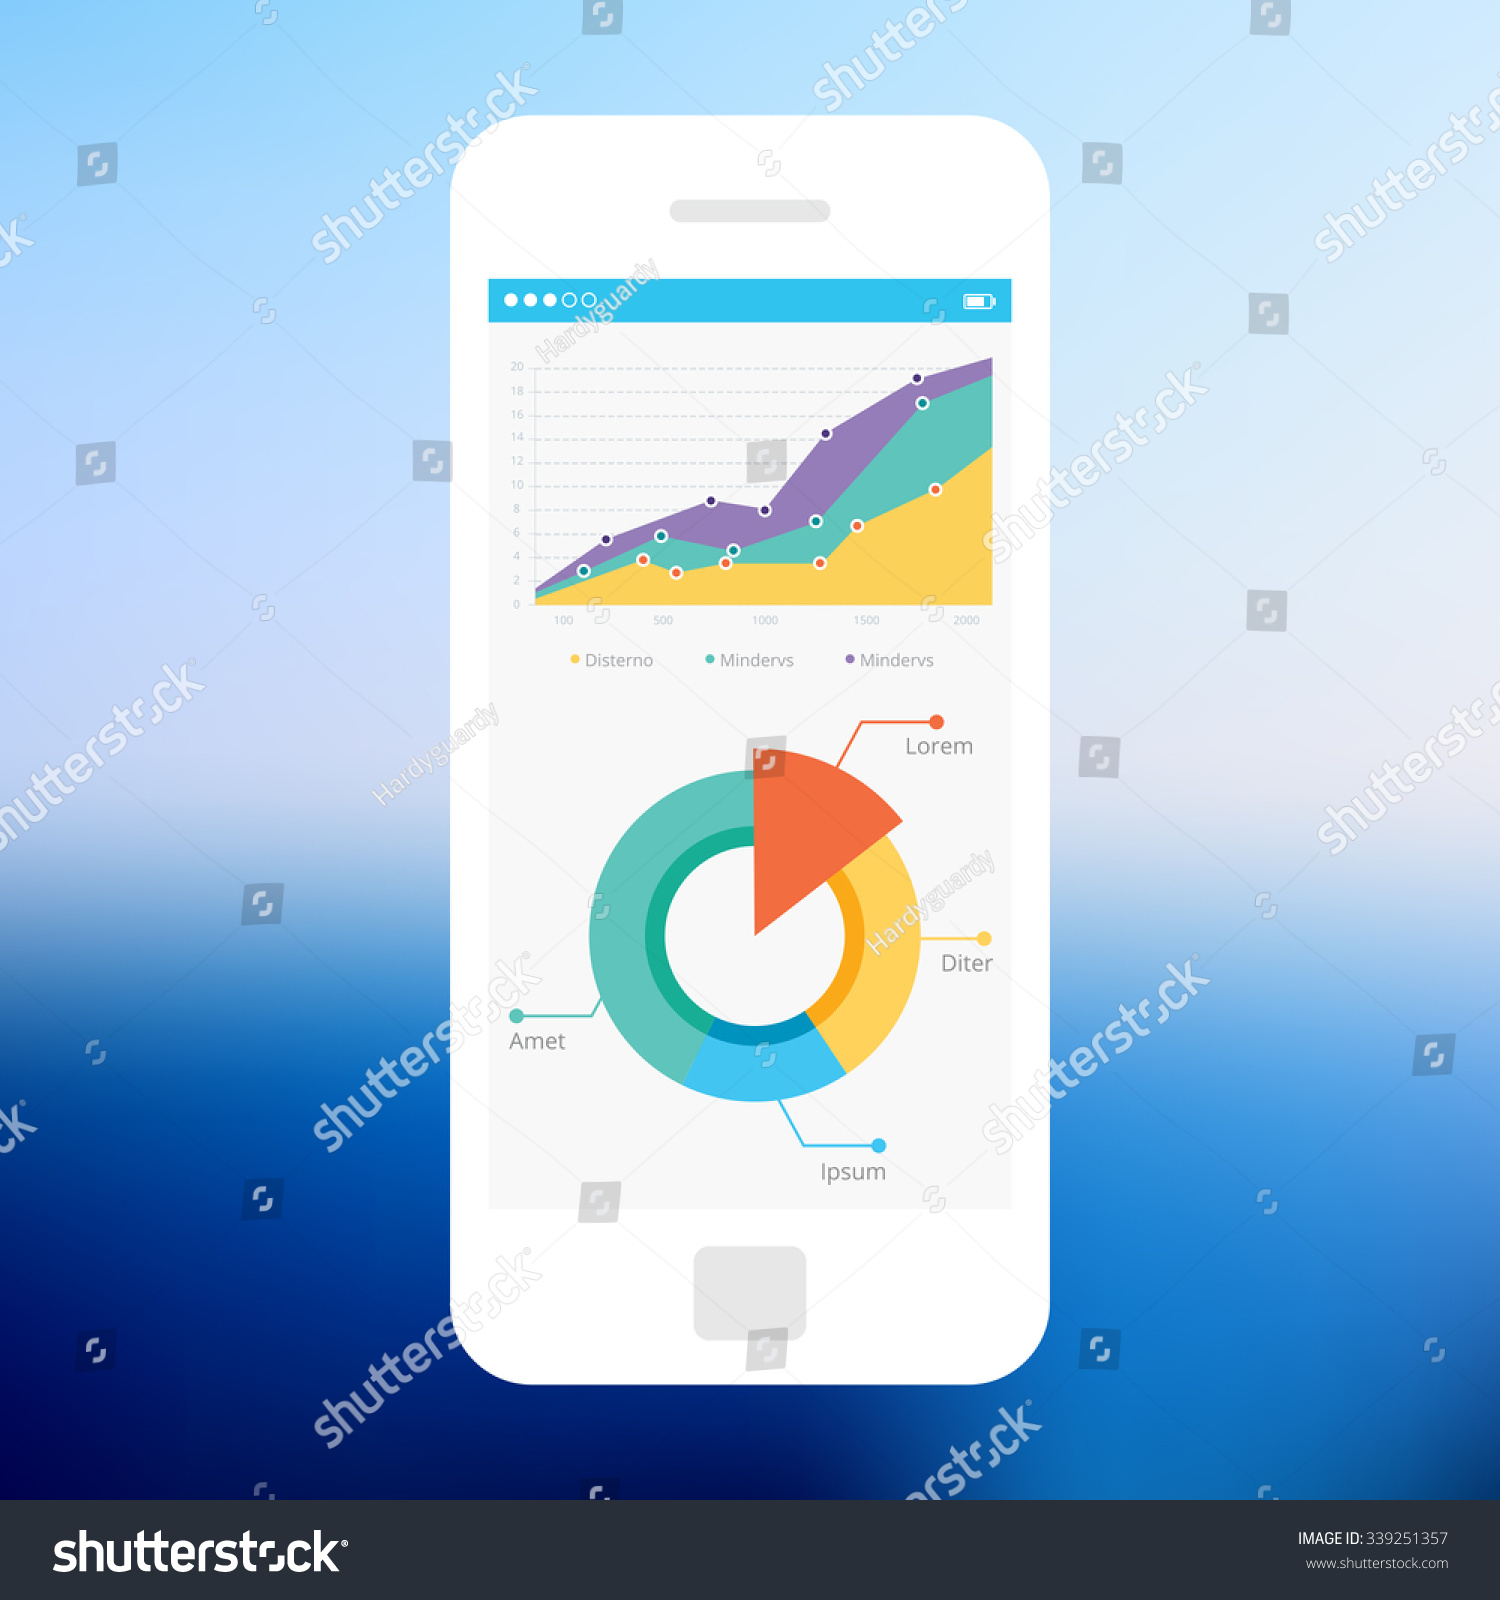 Mobile app single screen ui kit stock vector royalty free mobile app single screen ui kit statistics dashboard piechart information screen ccuart Gallery